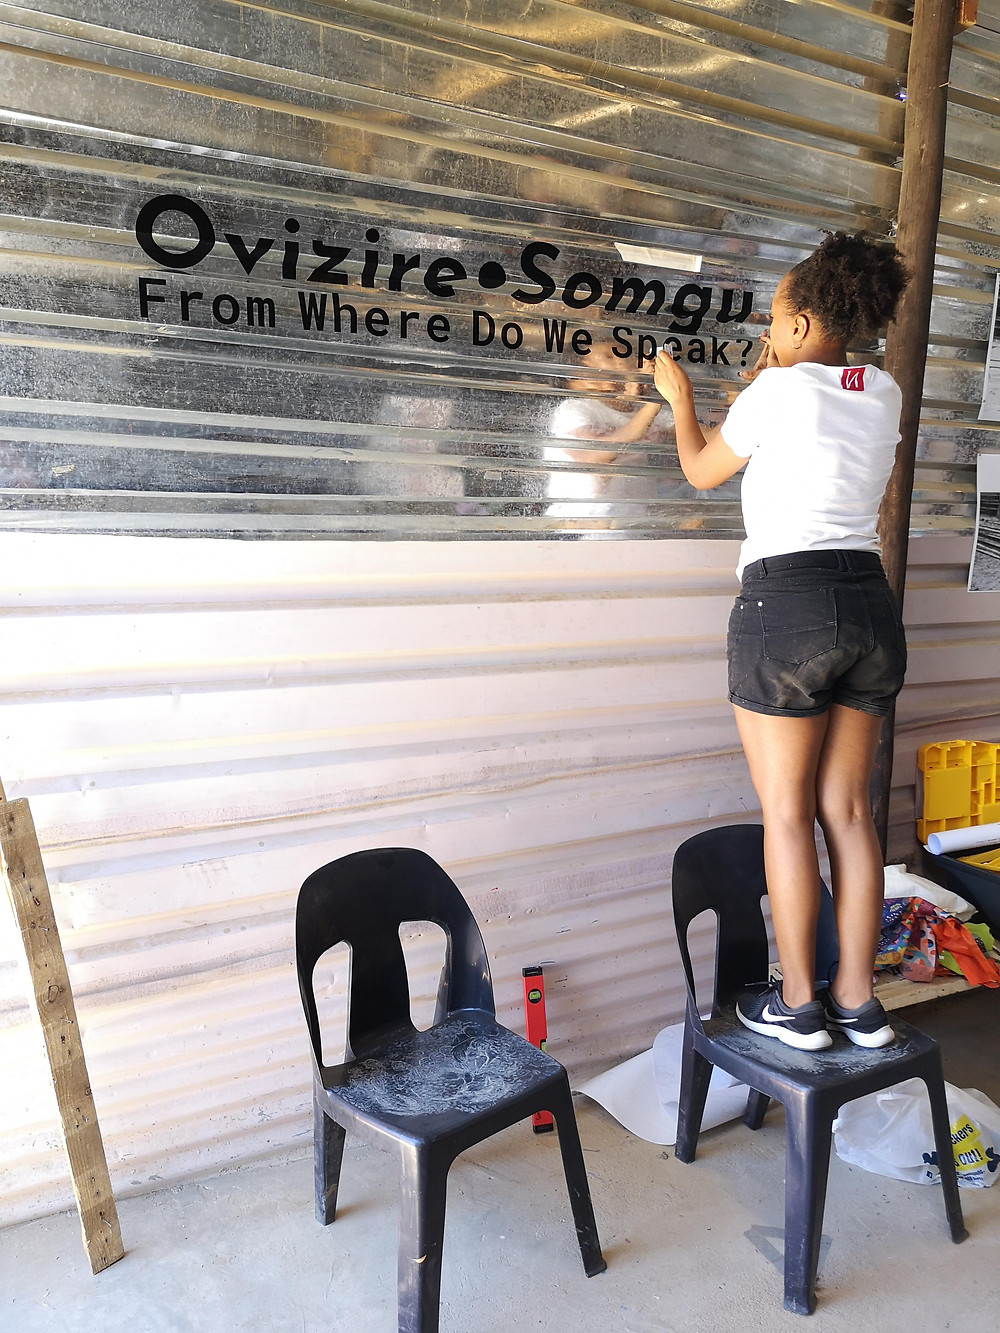 VitjituaNdjiharine install vinyl lettering on the wall of the Frans Nambinga Art Training Centre in Havana, Katutura, ahead of the opening 'Ovizire Somgu: From Where do we Speak'